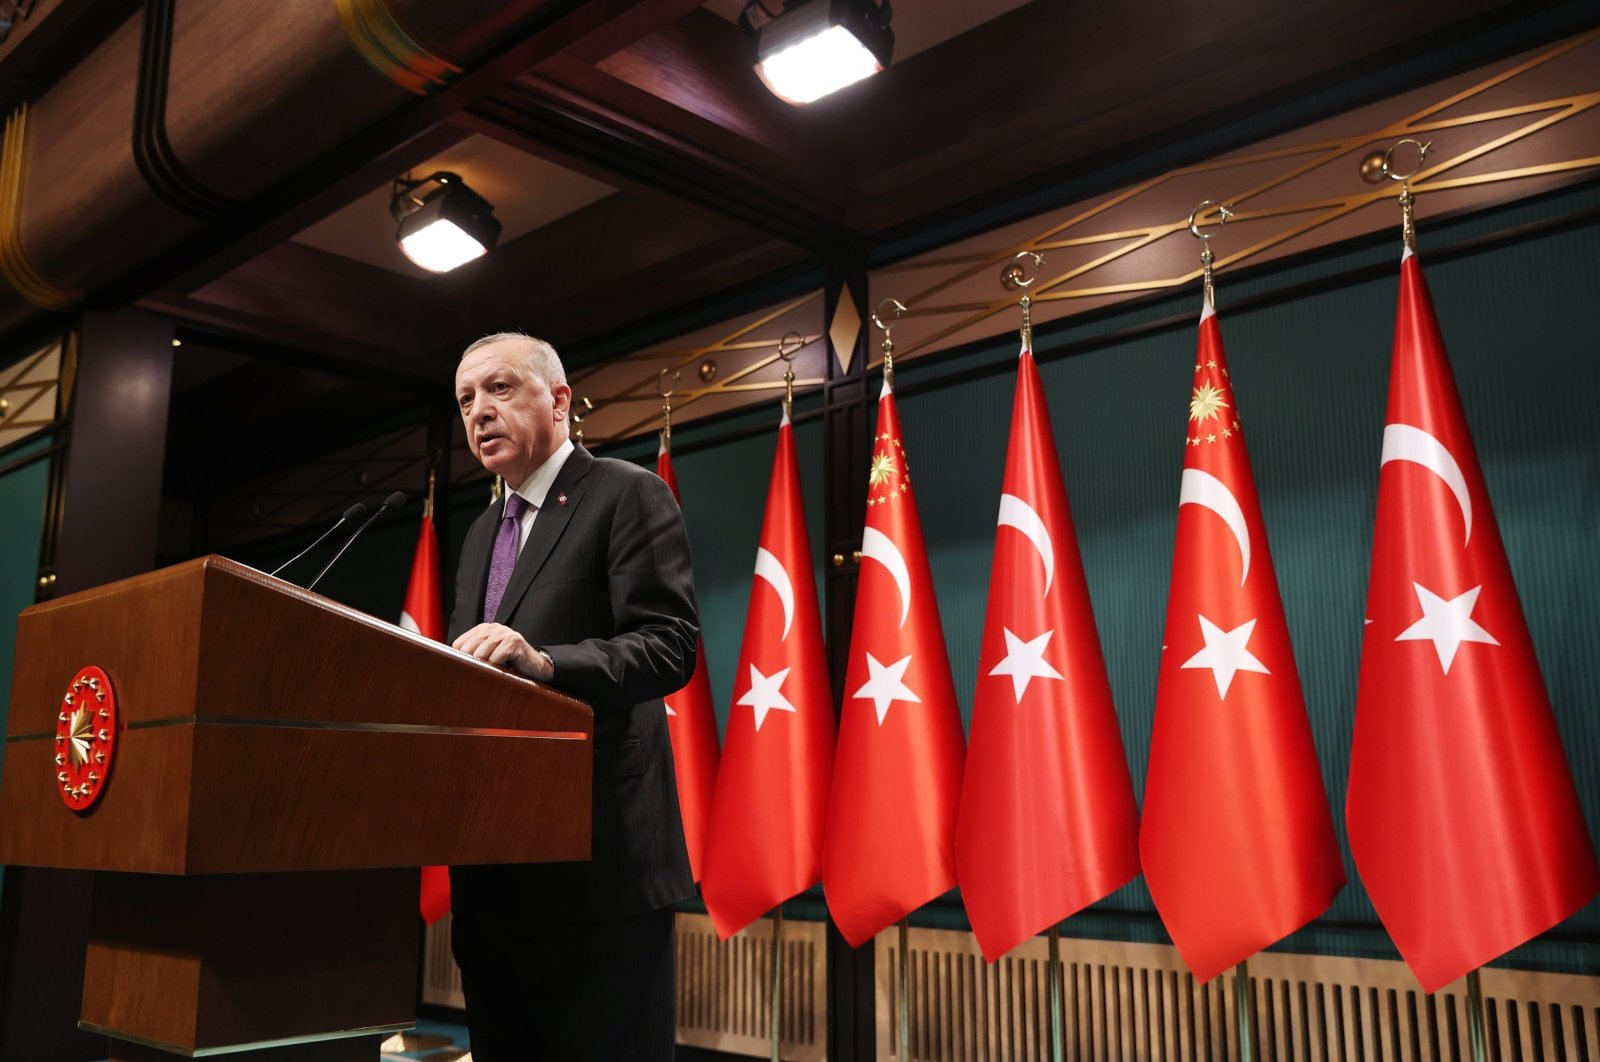 President Recep Tayyip Erdoğan gives a speech at the Presidential Complex in Ankara, Turkey on Feb. 1, 2021 (AA File Photo)